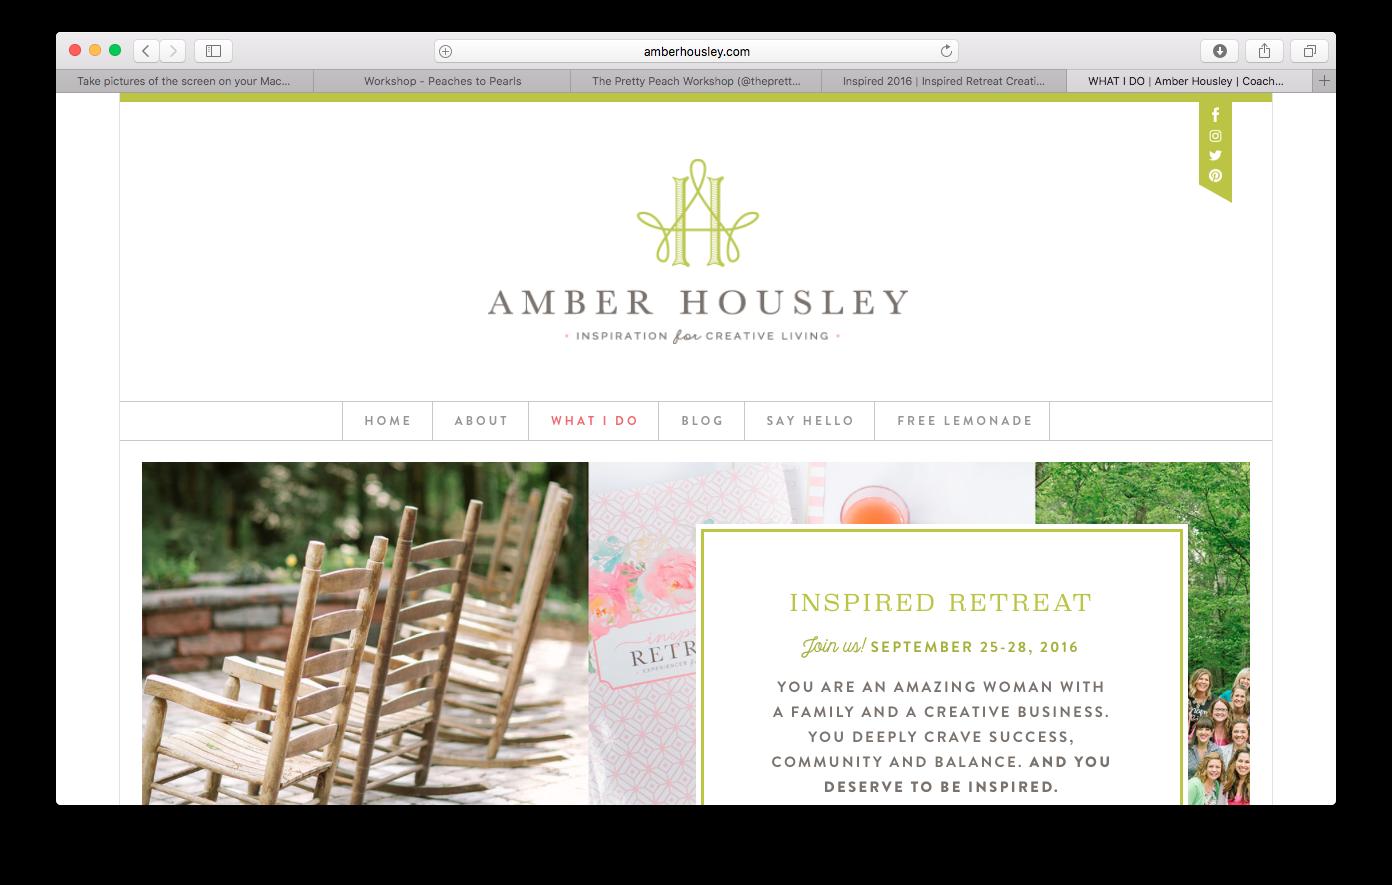 http://amberhousley.com/what-i-do